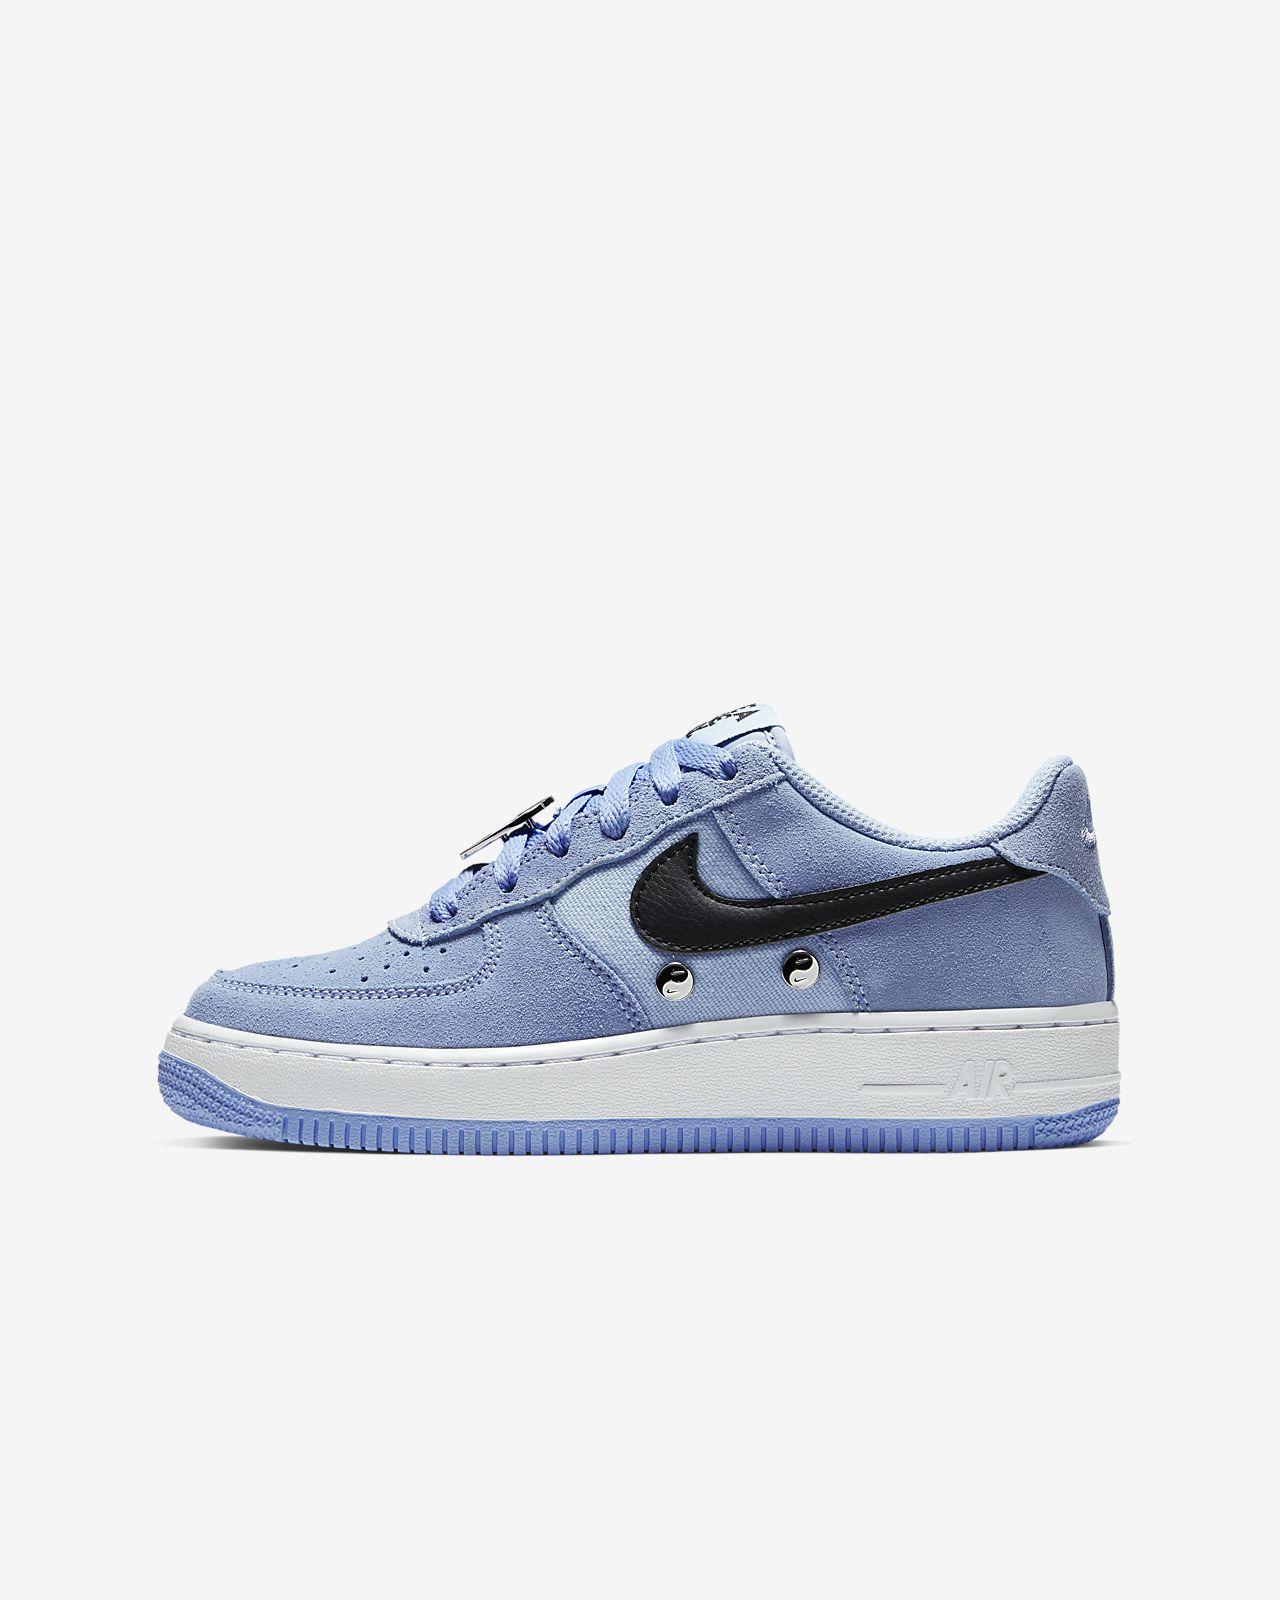 Nike Air Force 1 LV8 Kinderschoen